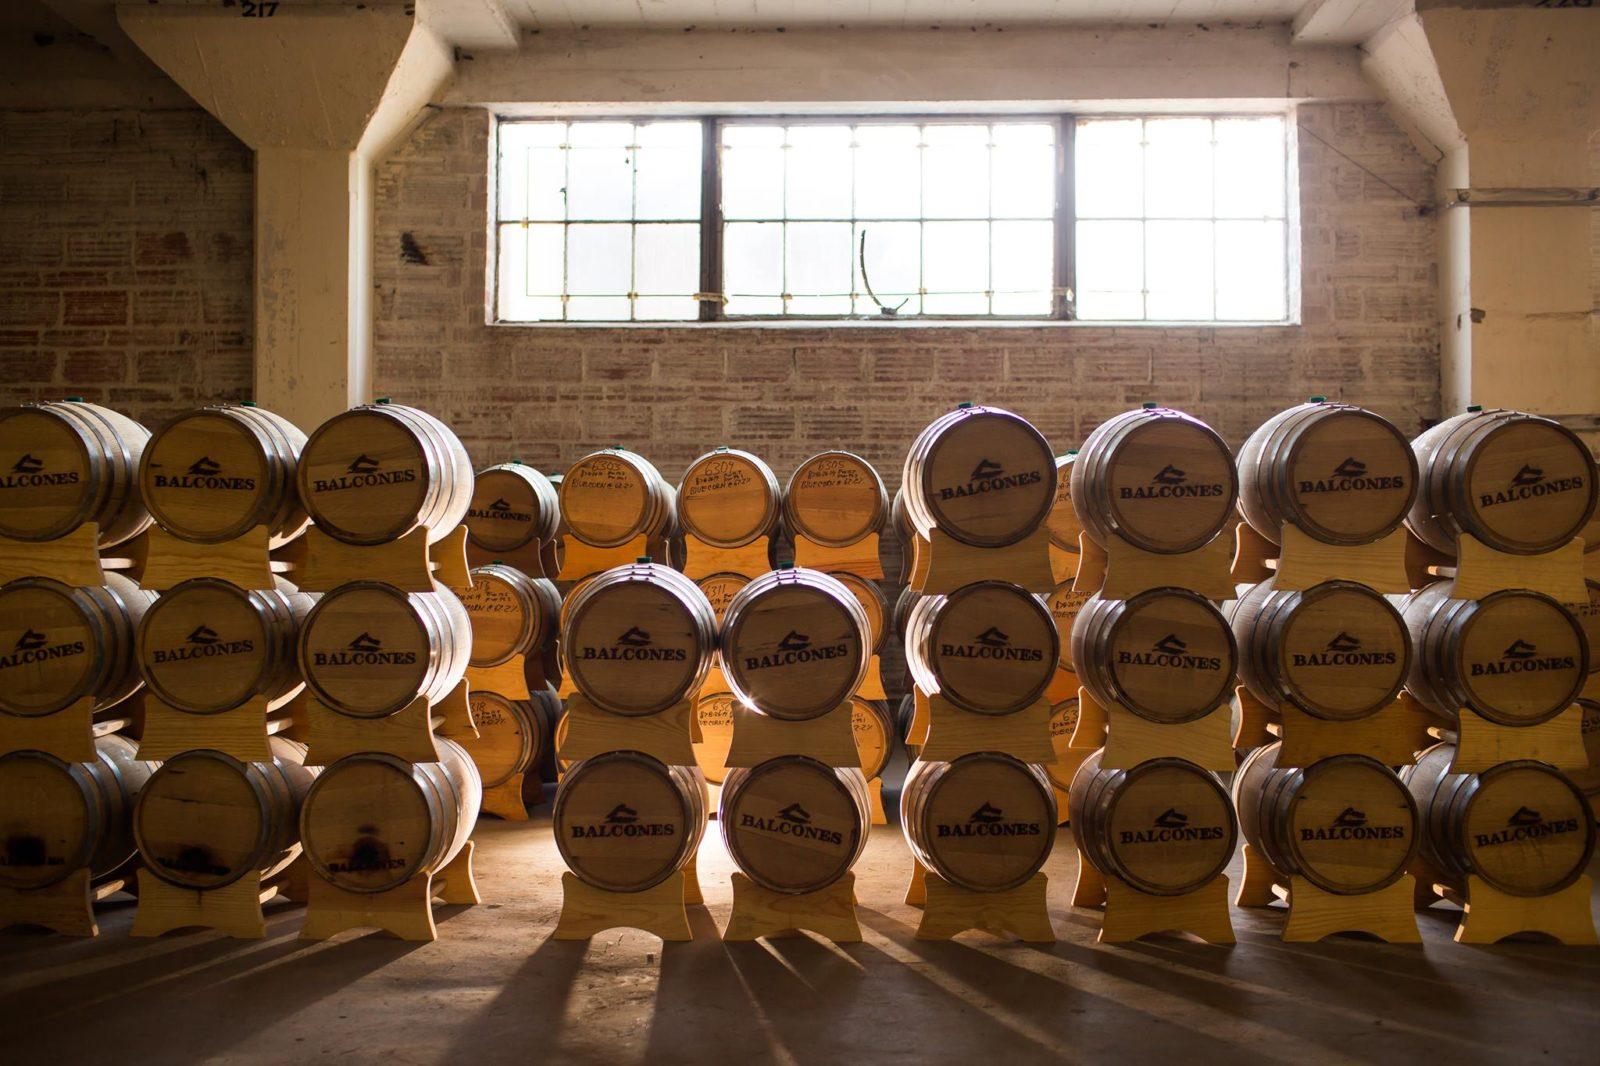 Balcones distillery waco the heart of texas for American classic homes waco tx